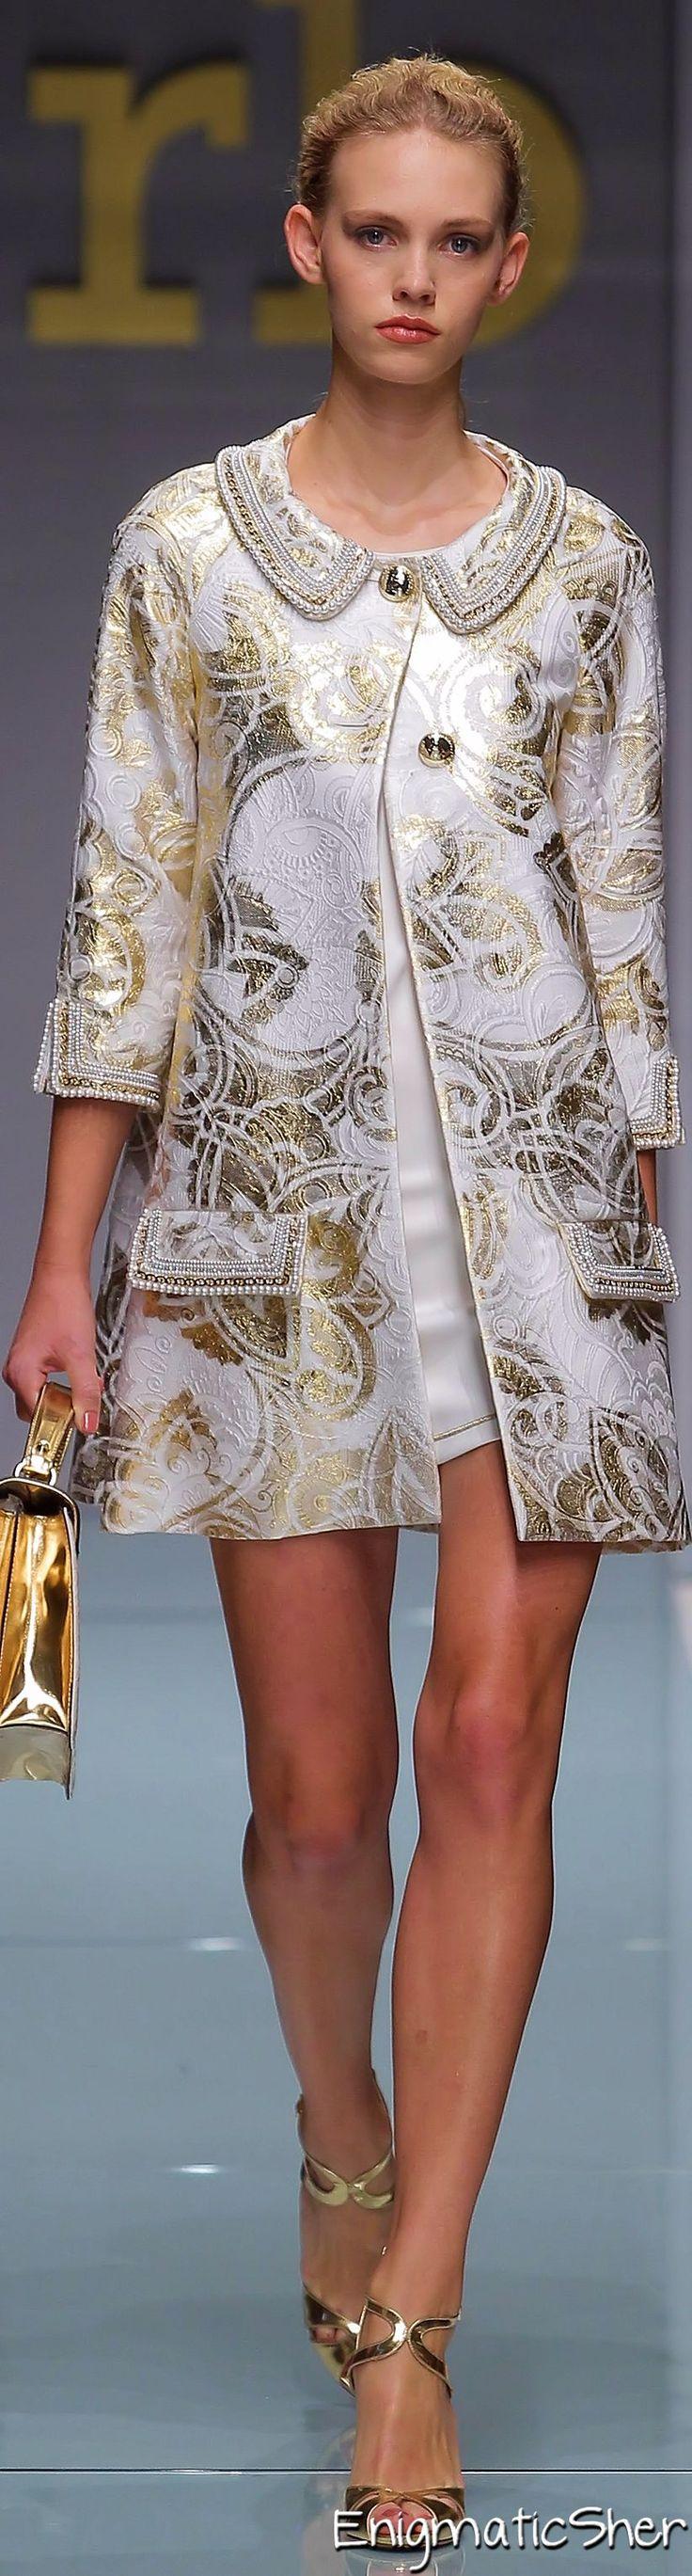 Roccobarocco ~ Spring Mini, White w Gold Embellishments 2015